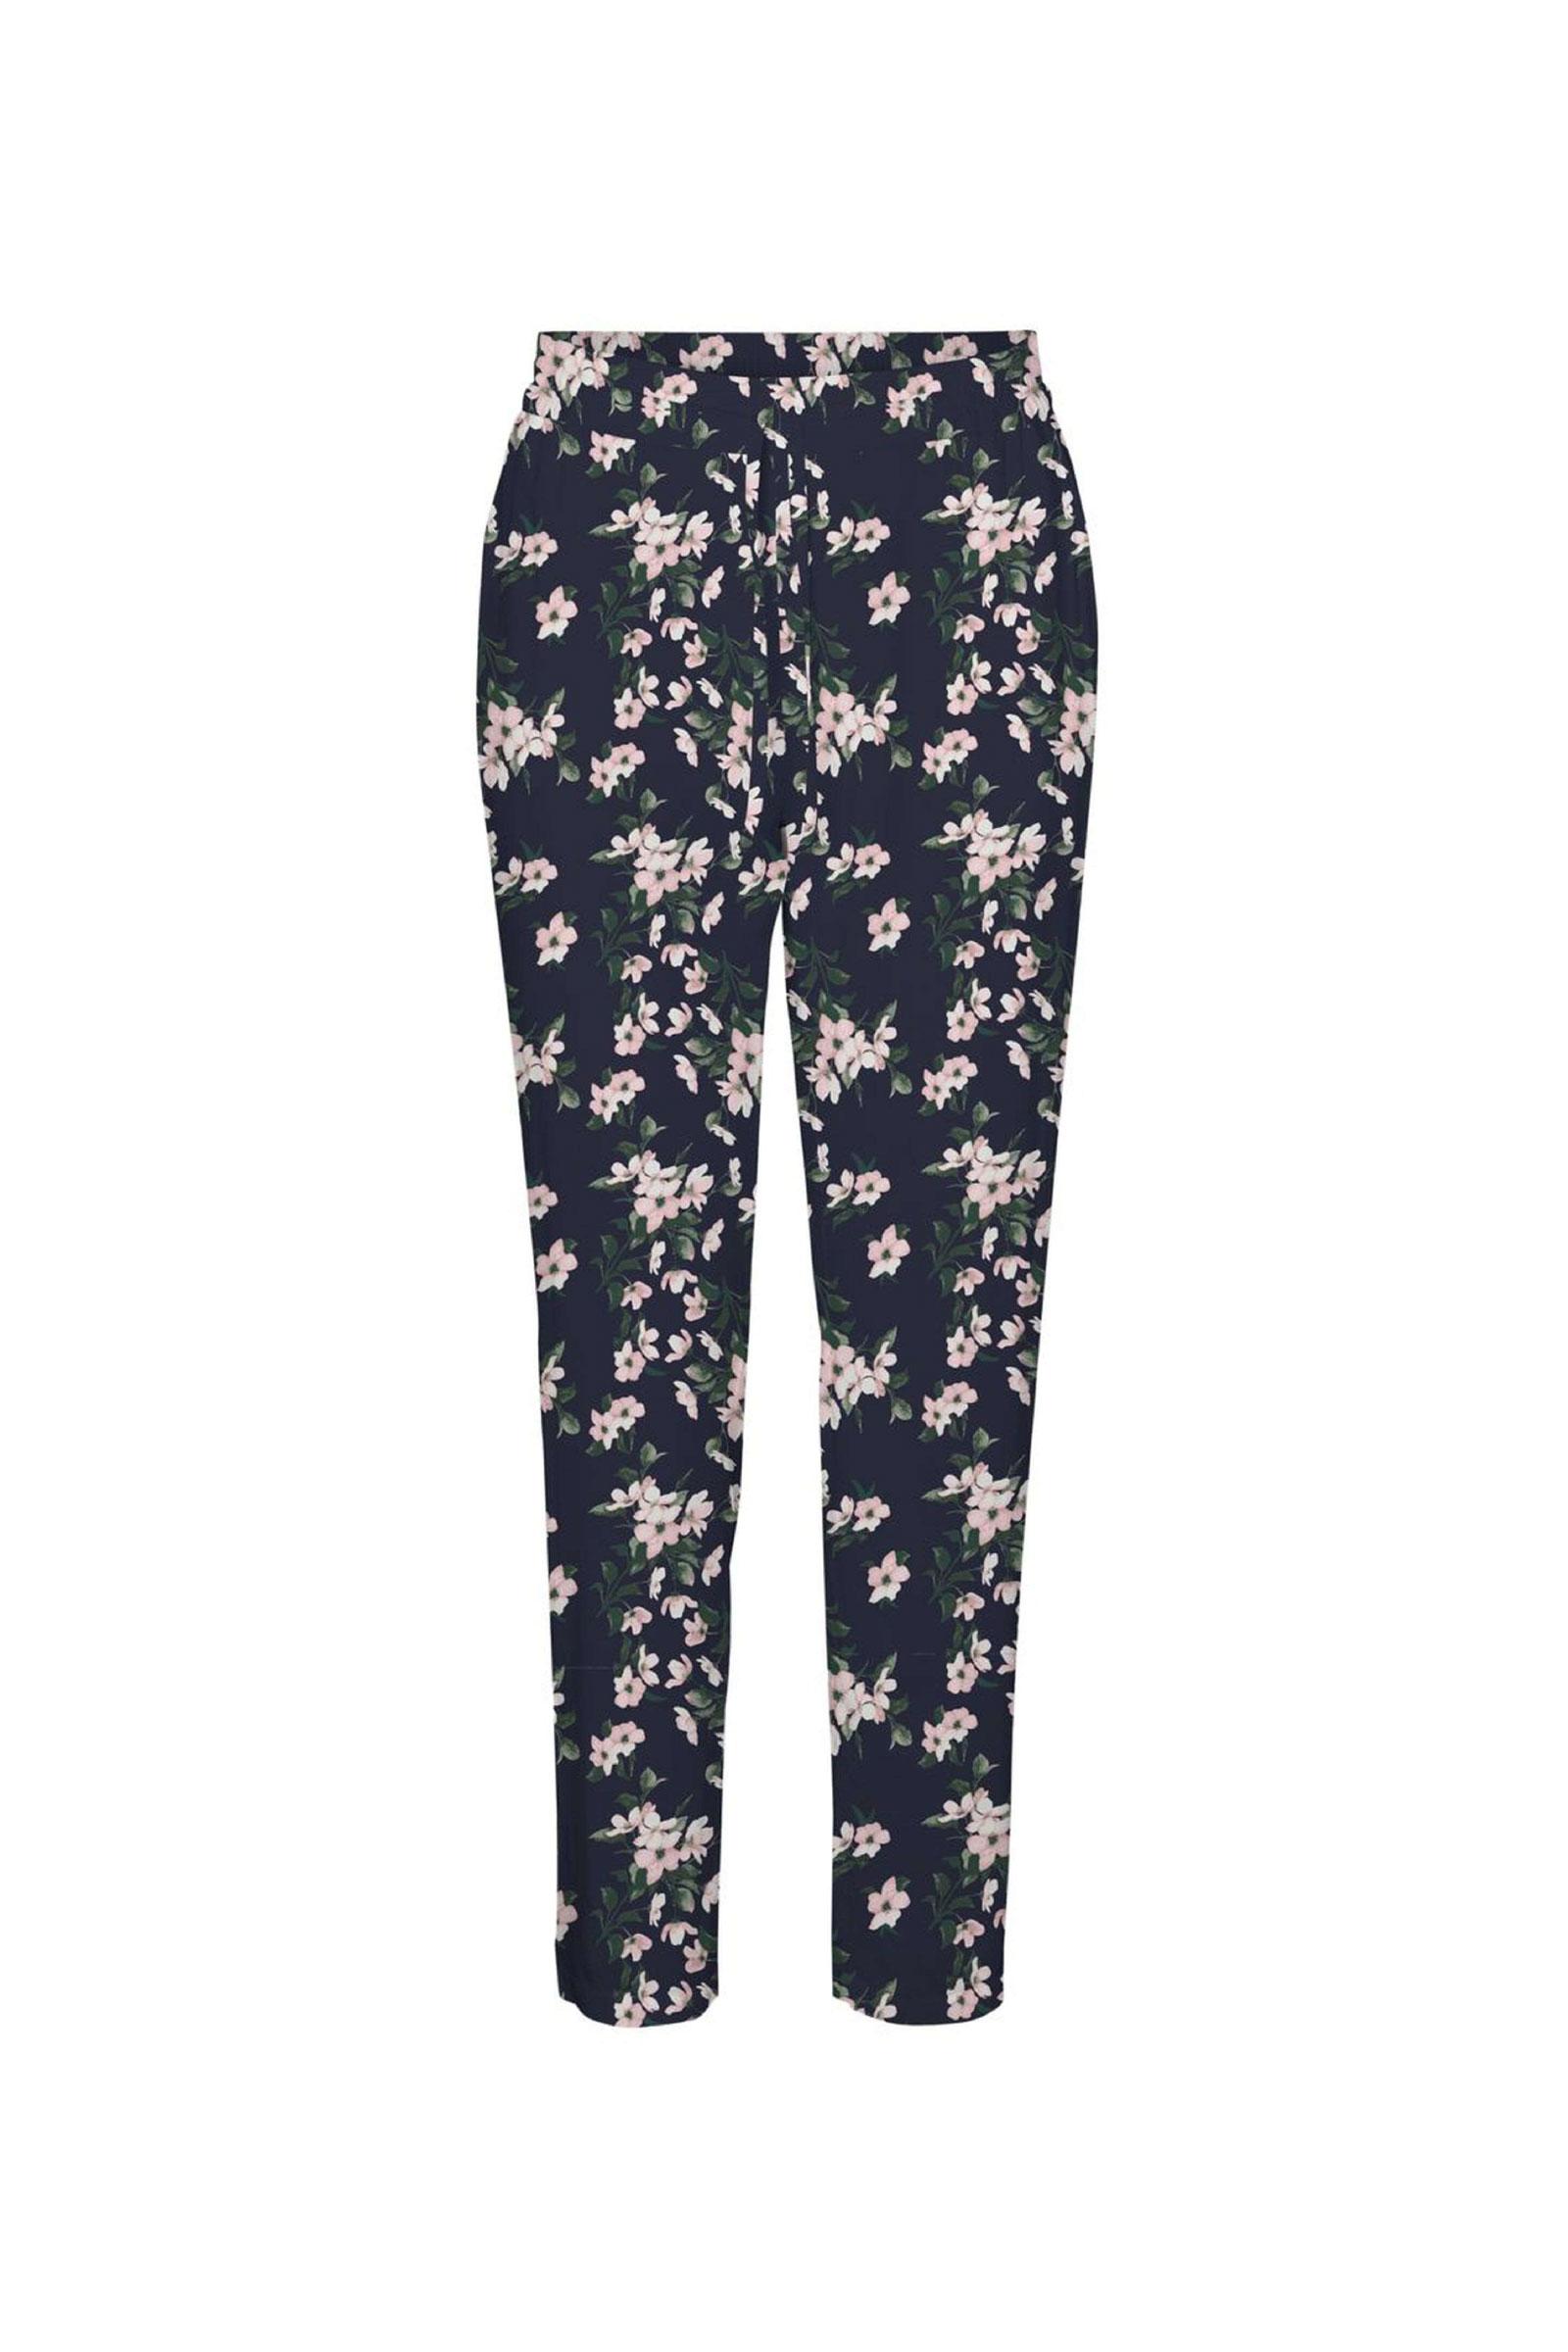 VERO MODA PANTALONE Donna Modello SIMPLY VERO MODA | Pantalone | 10245160AOP-VIBE